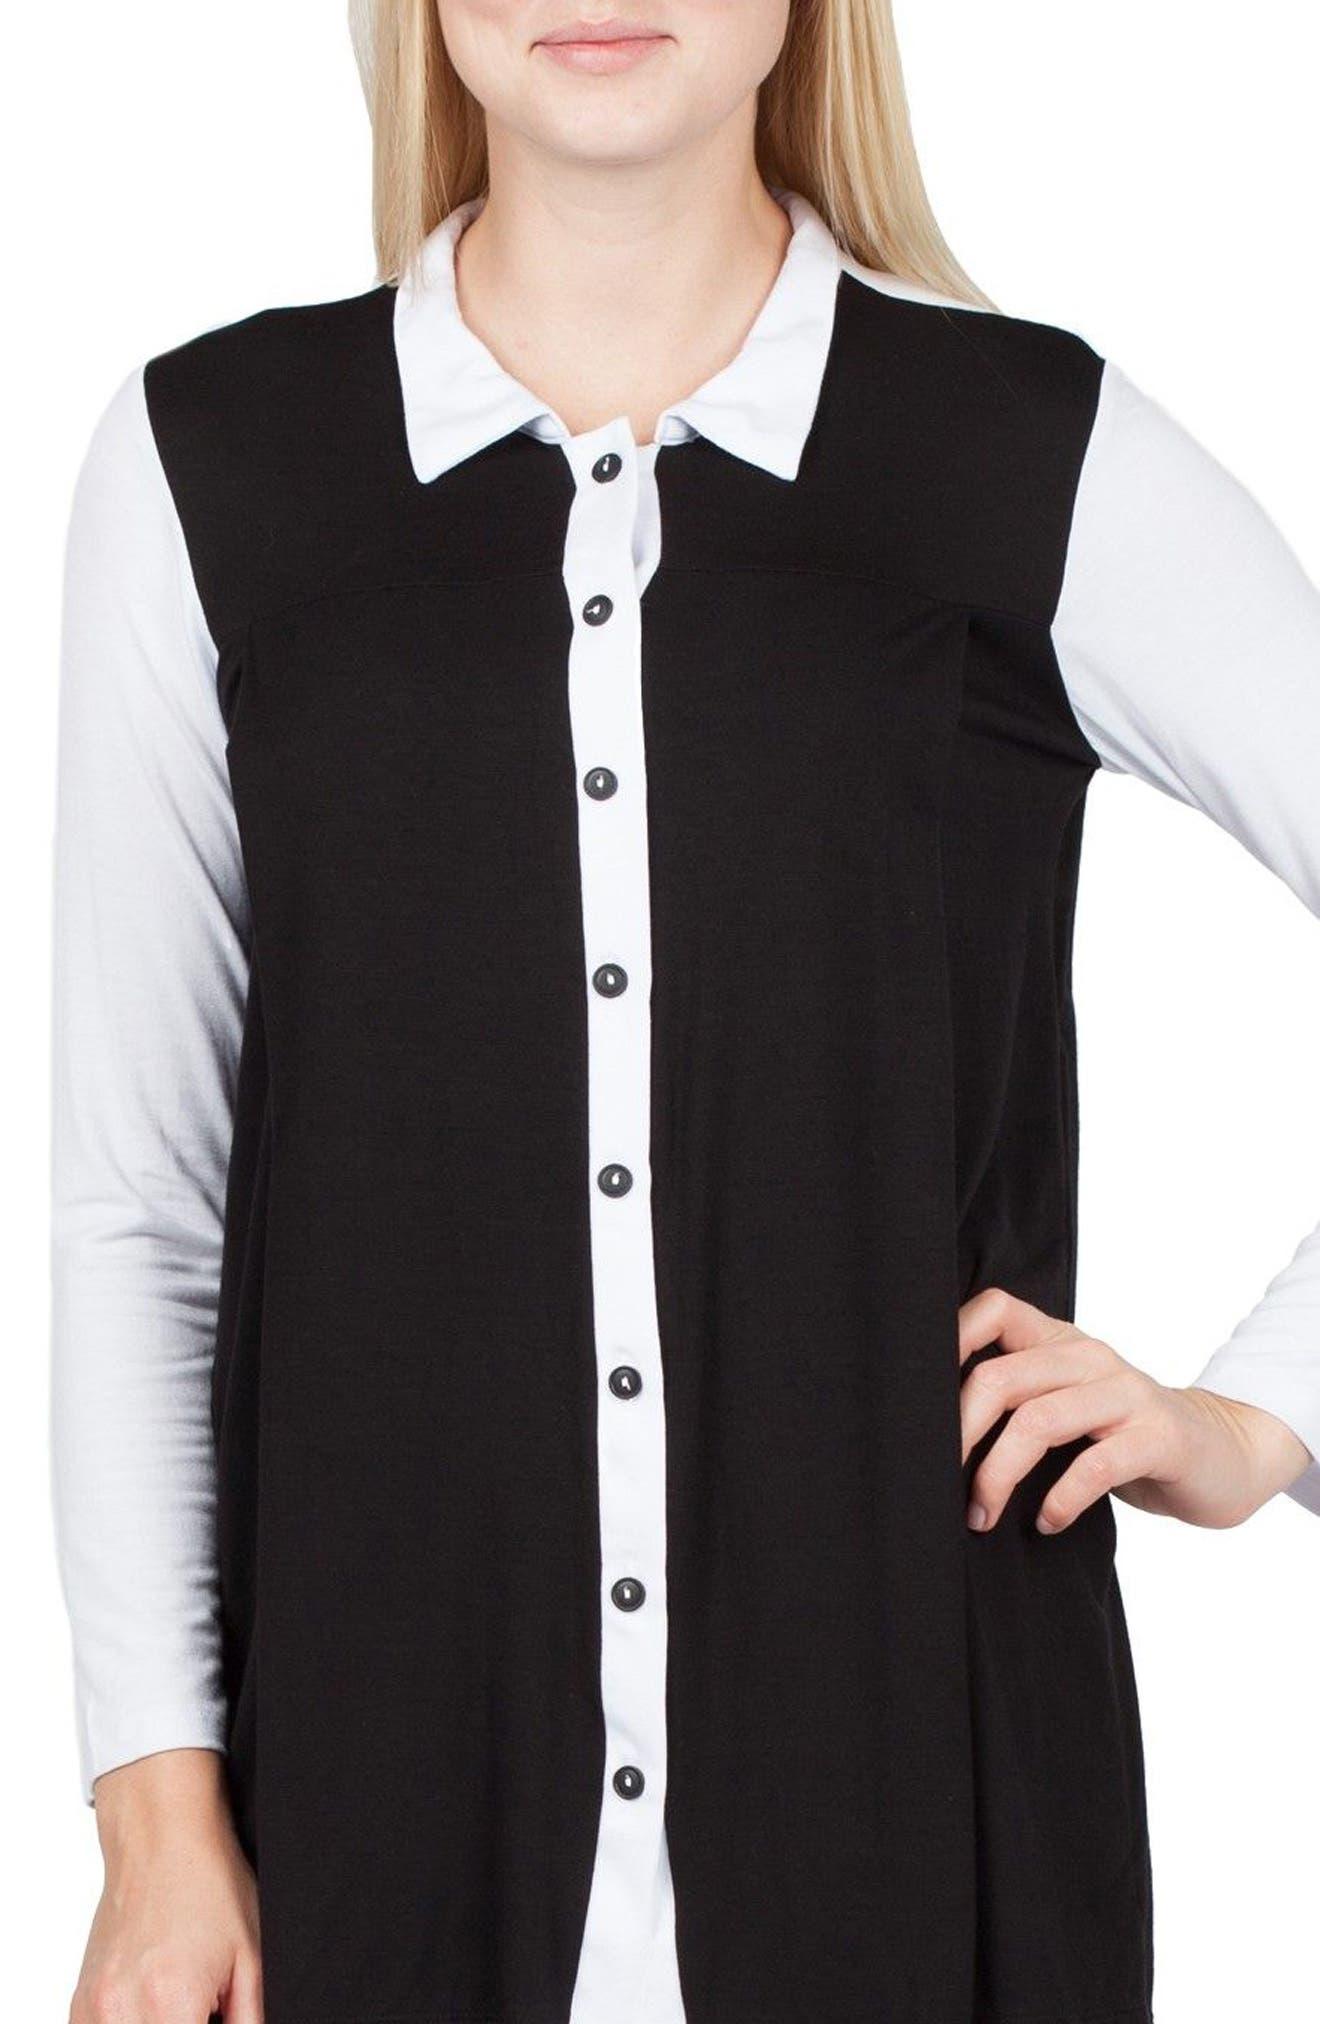 Berlin Colorblock Maternity/Nursing Tunic,                             Main thumbnail 1, color,                             Black/ White Contrast